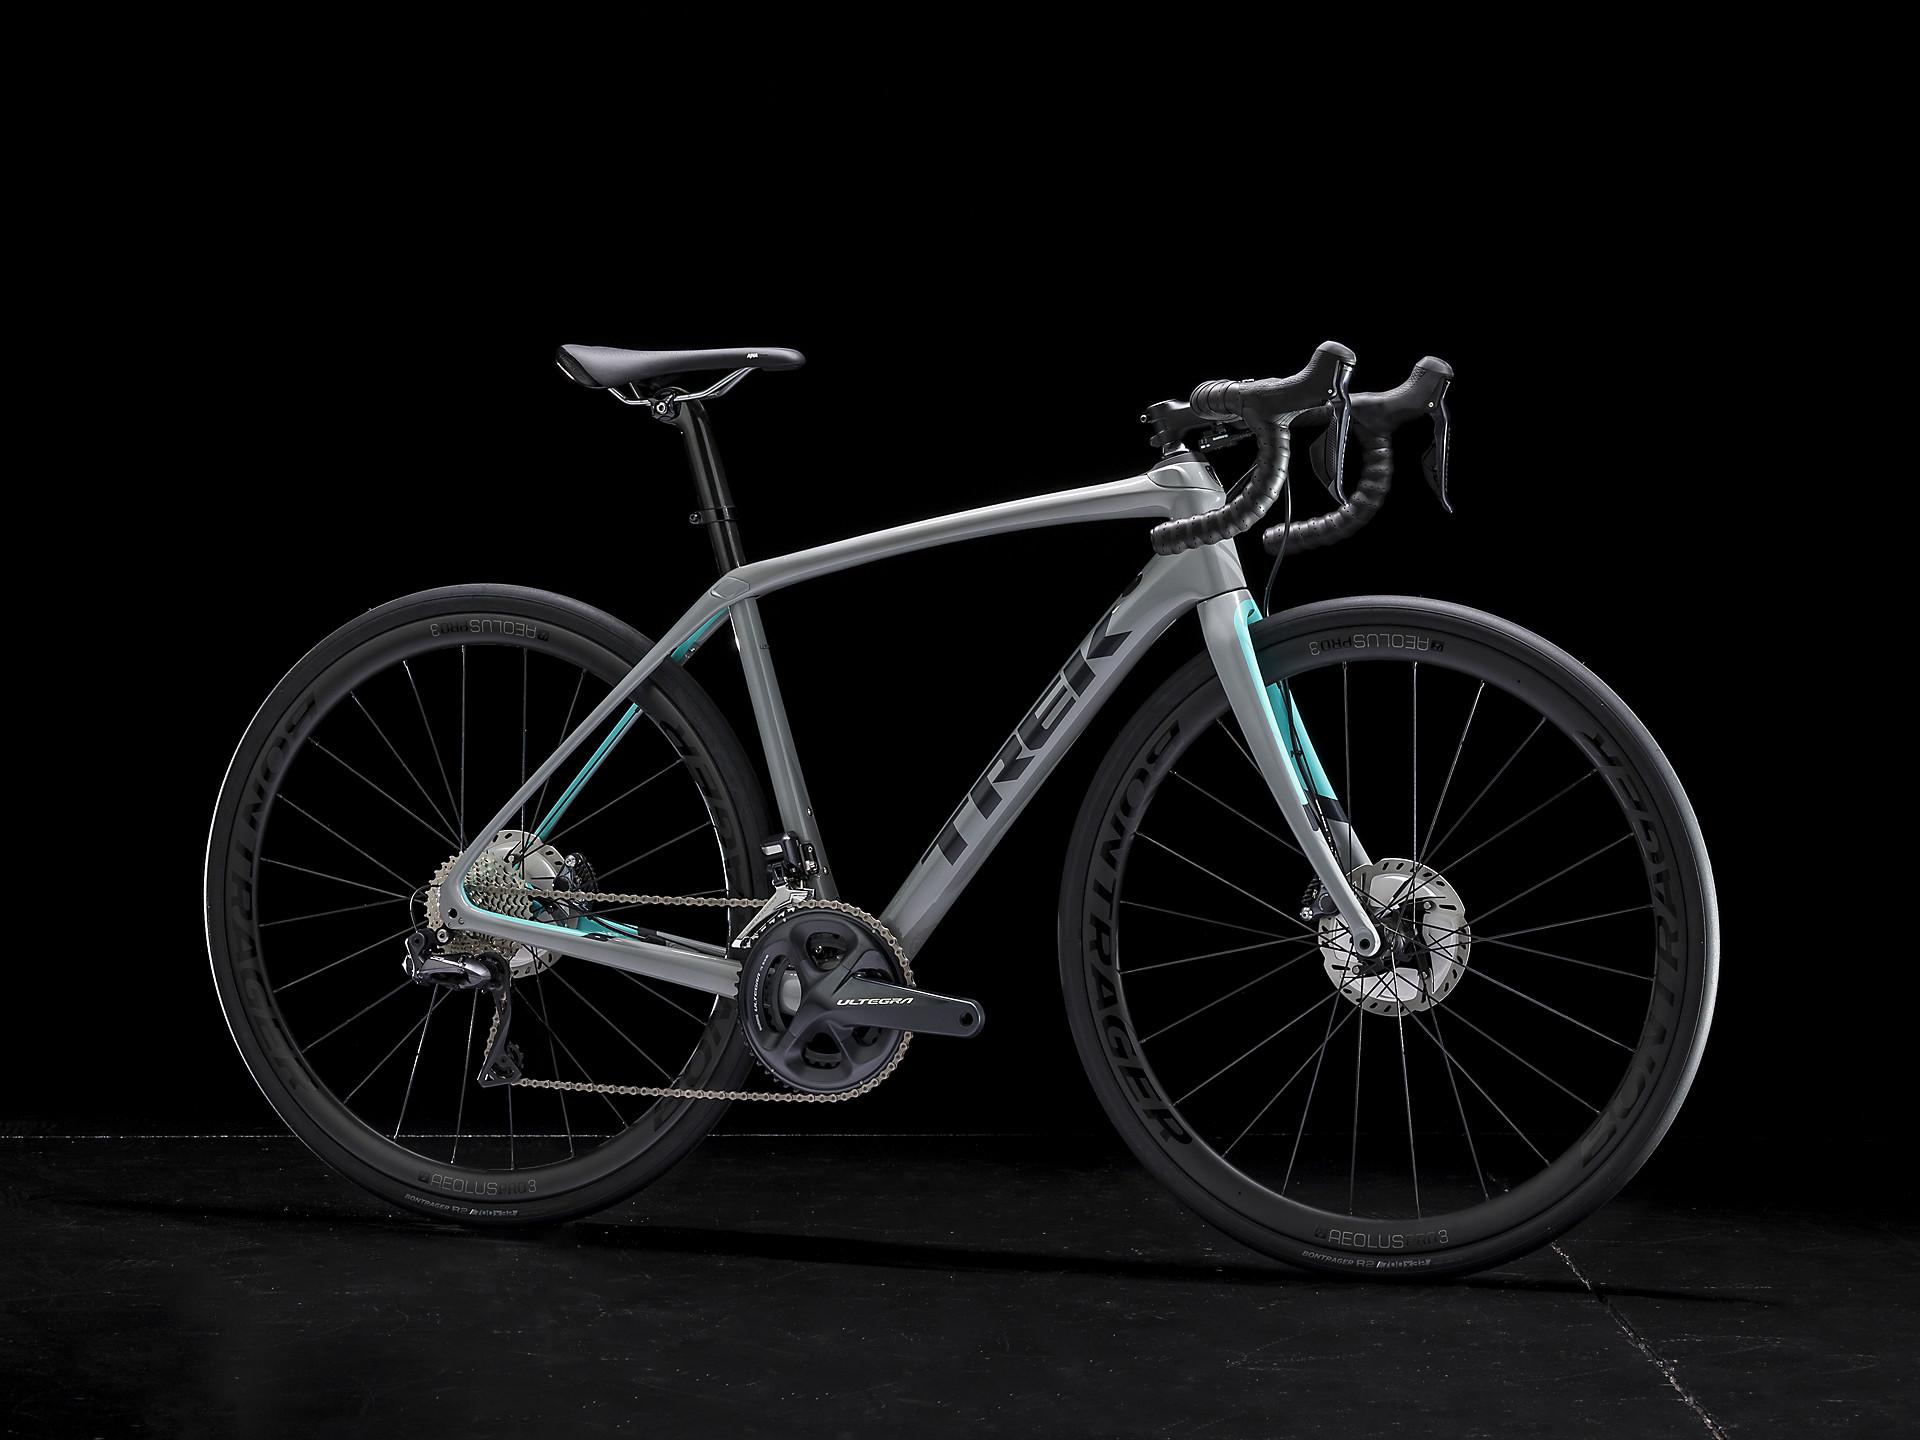 1a2ffe29bd4 Domane SL 7 Disc Women's | Trek Bikes (CA)